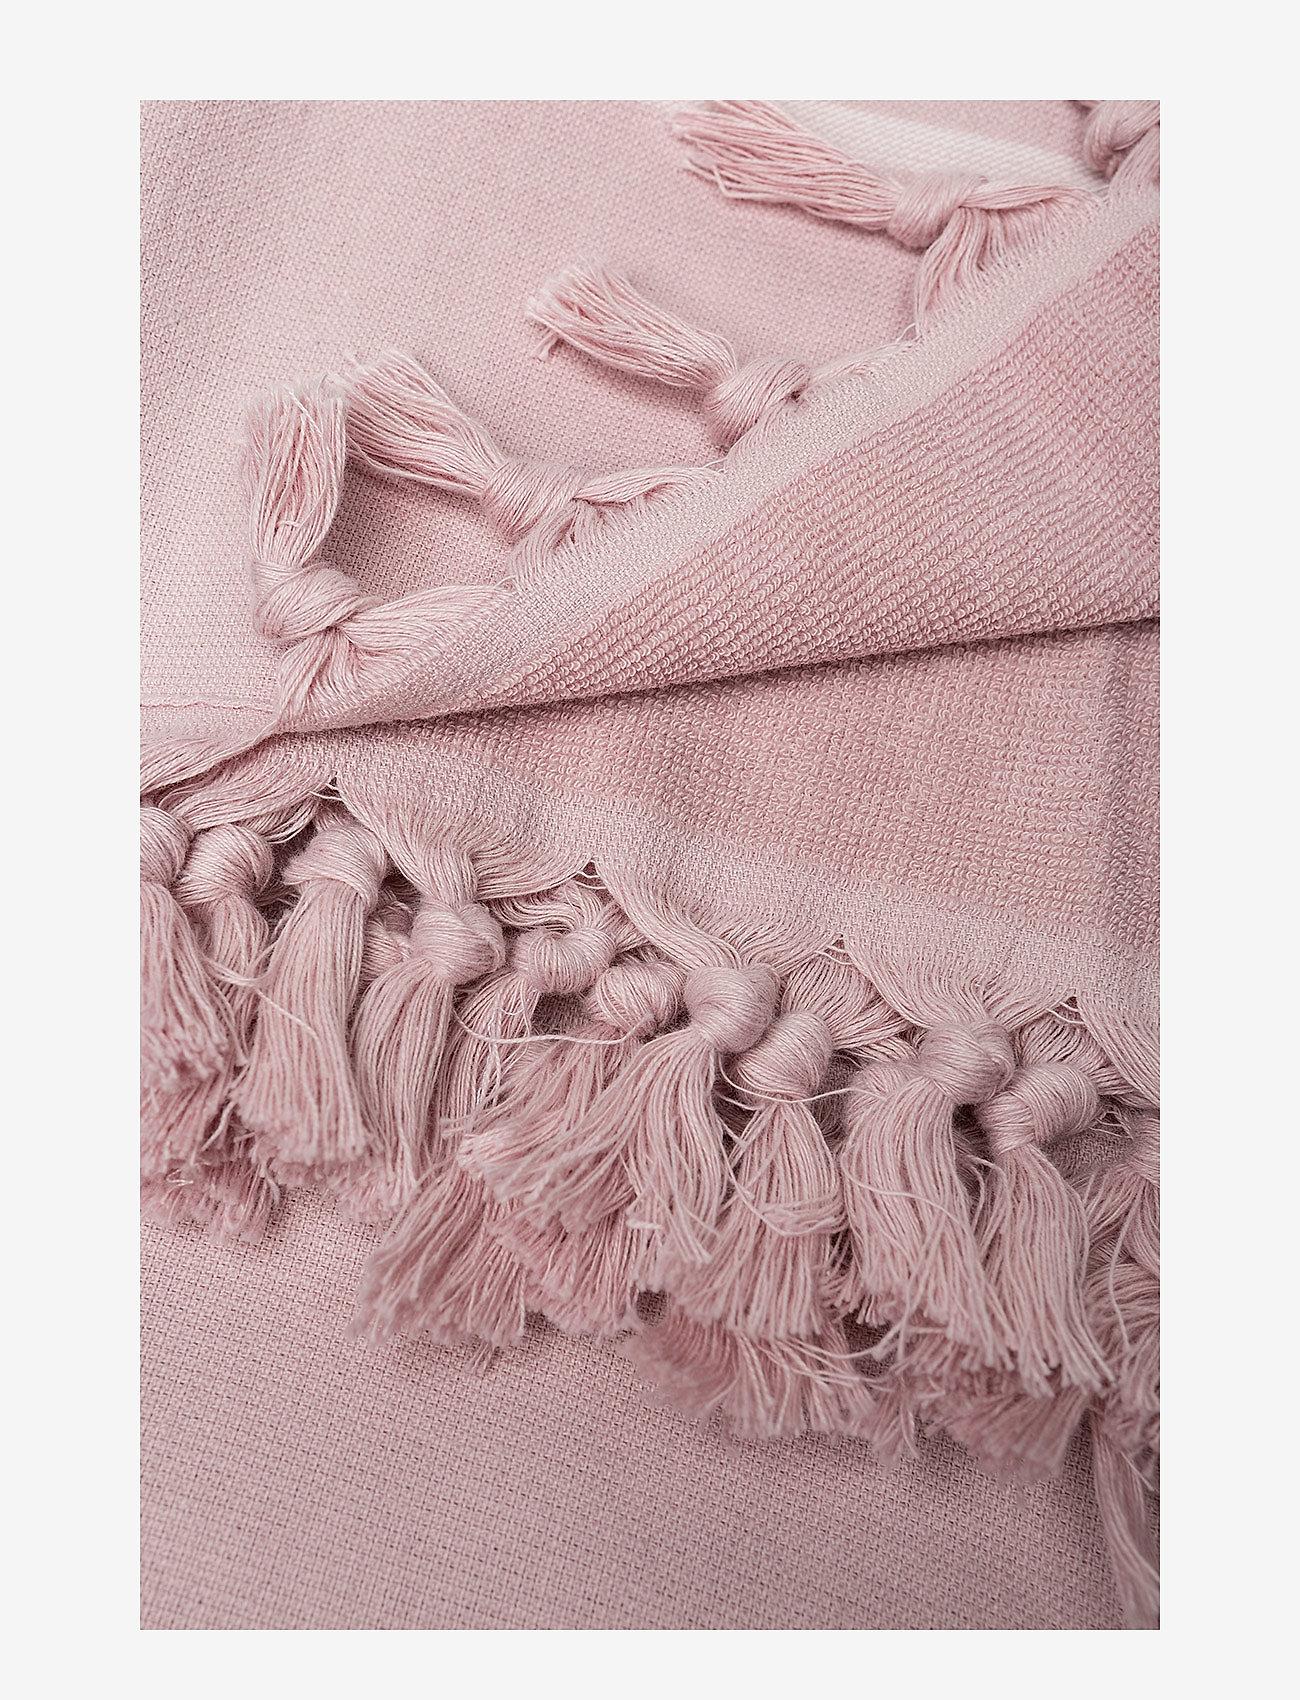 Gripsholm - TOWEL HAMAM - towels - pink lilac - 1